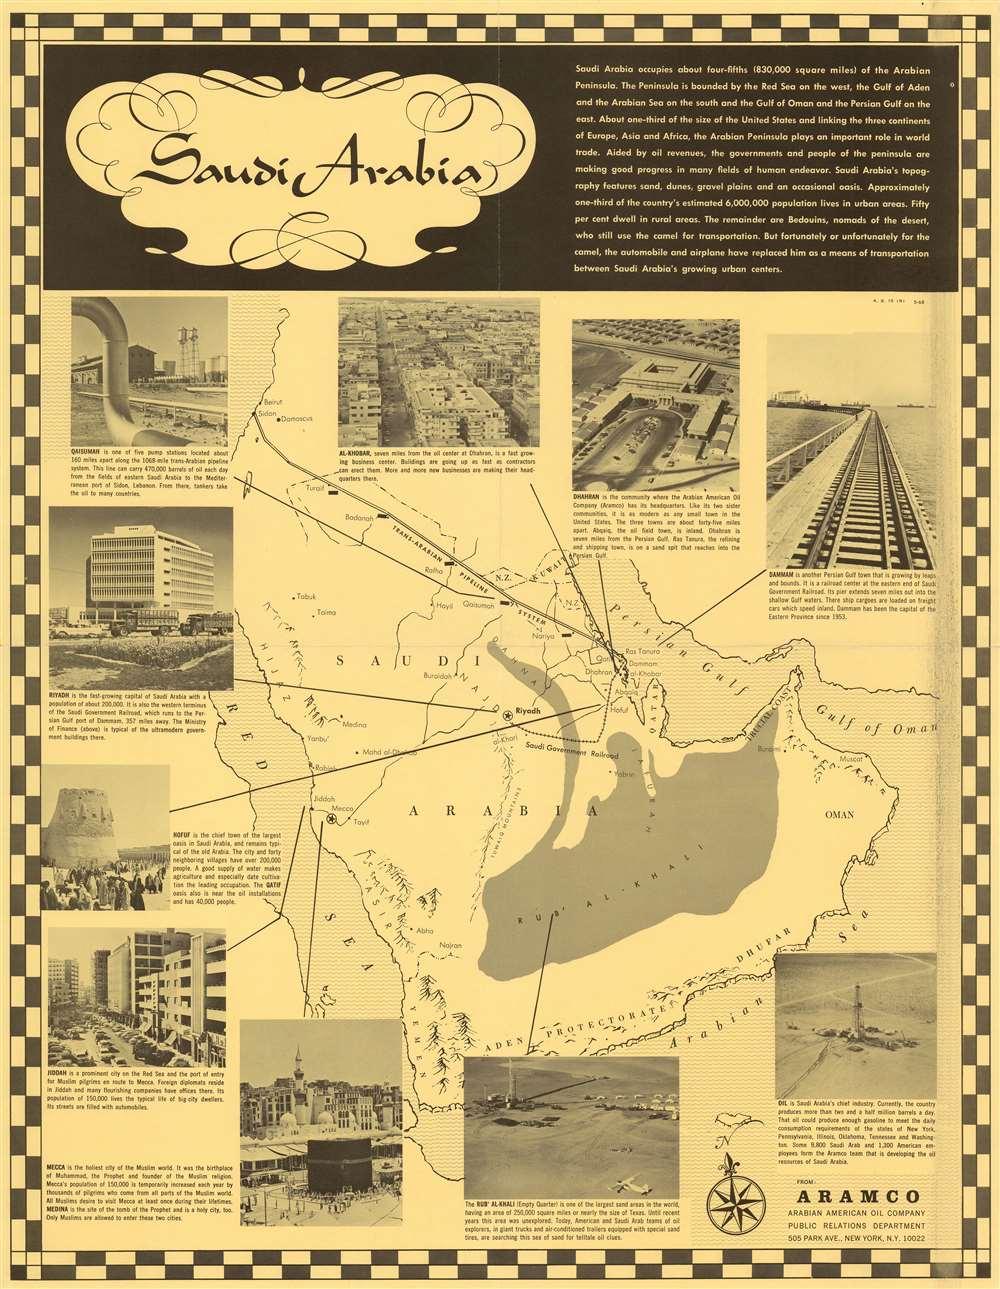 1968 Aramco Map of Saudi Arabia